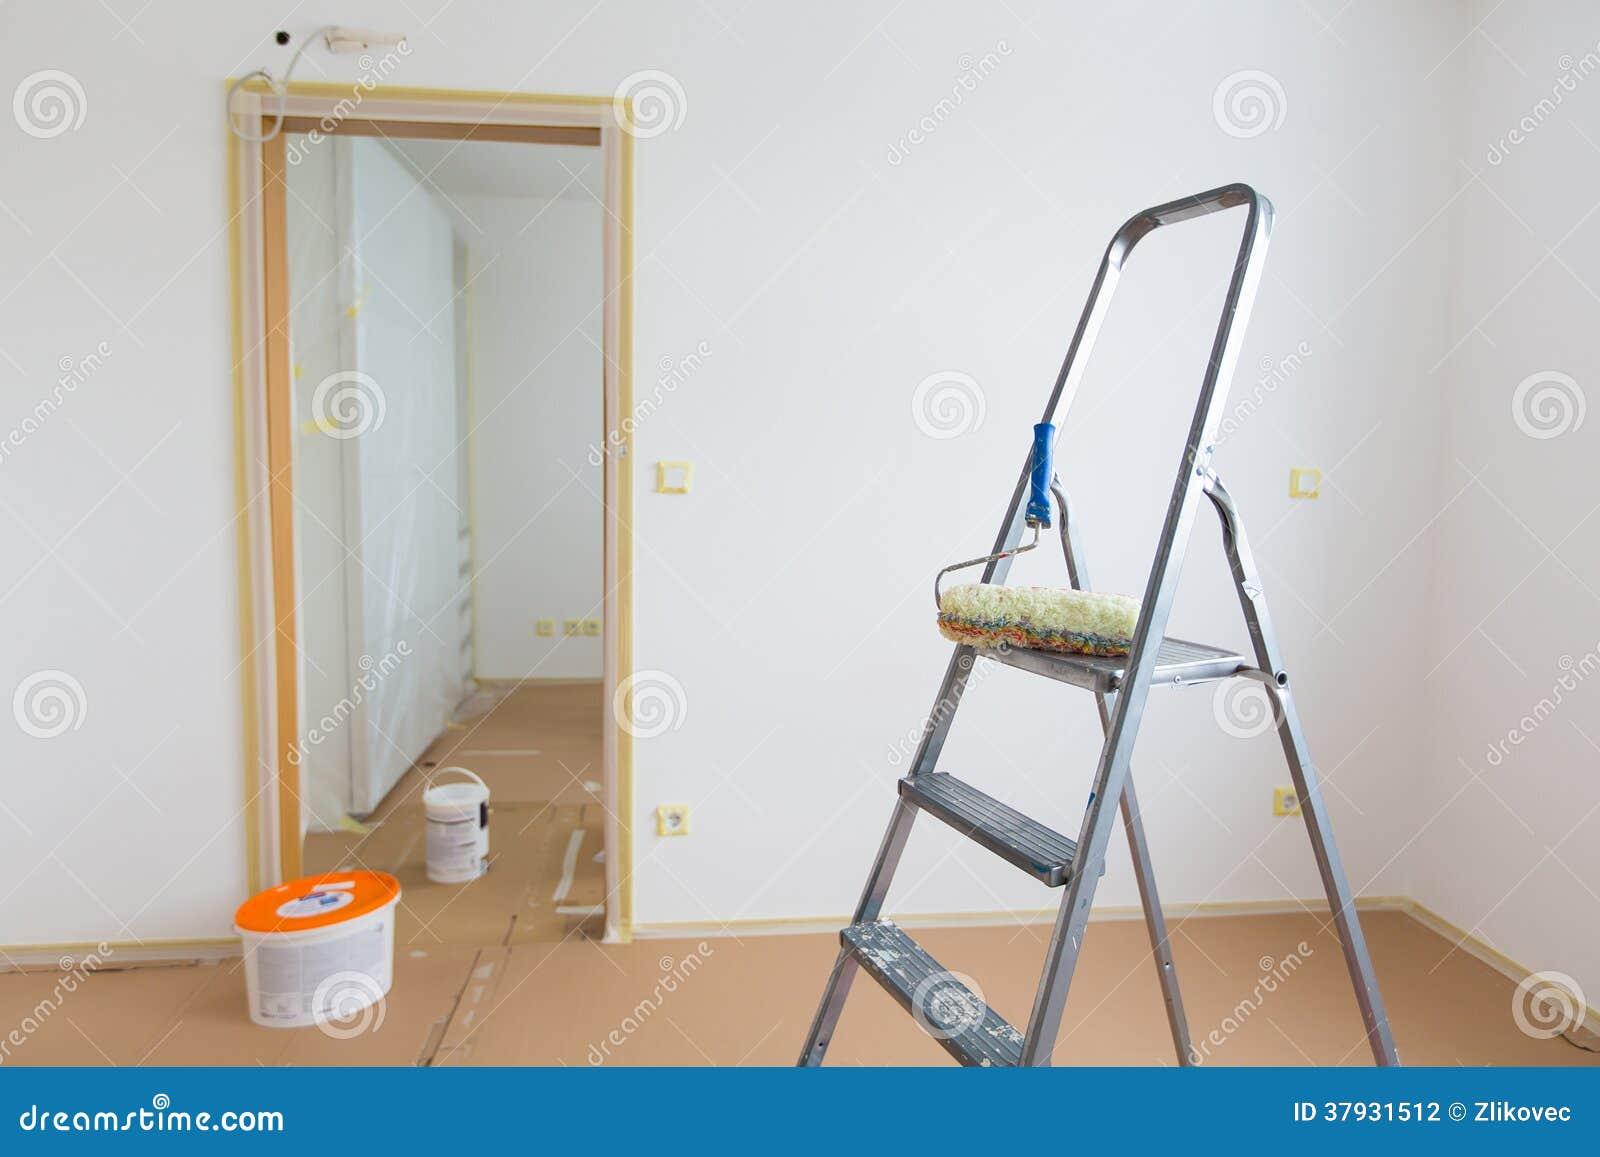 Домашняя реновация